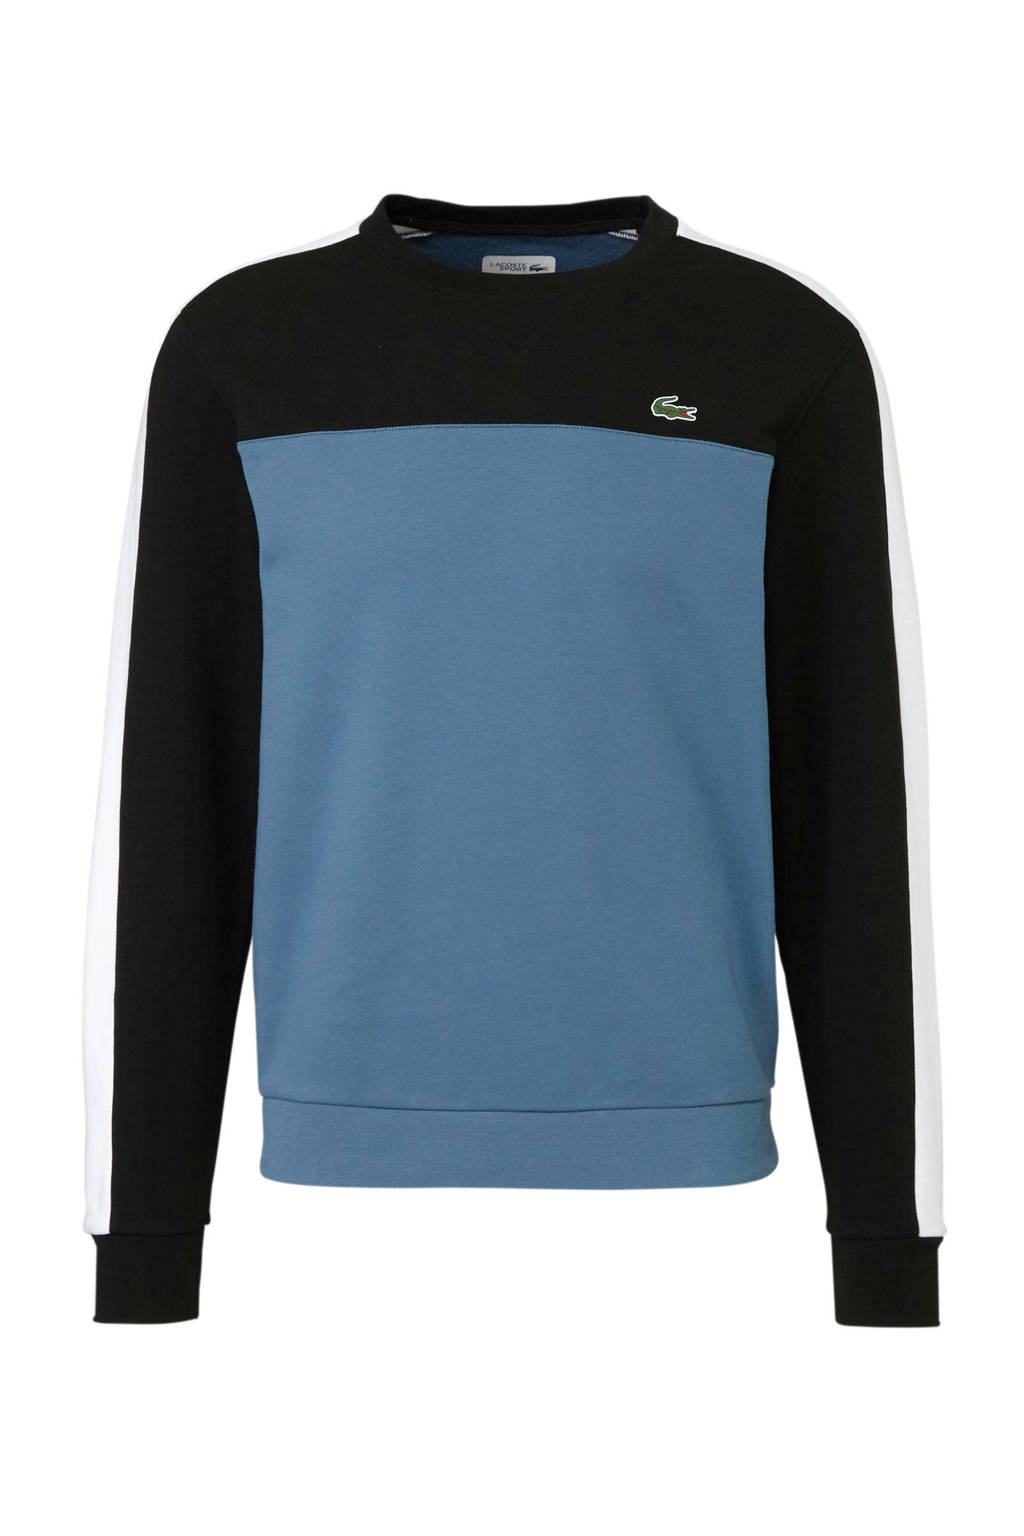 Lacoste   sportsweater blauw/zwart/wit, Blauw